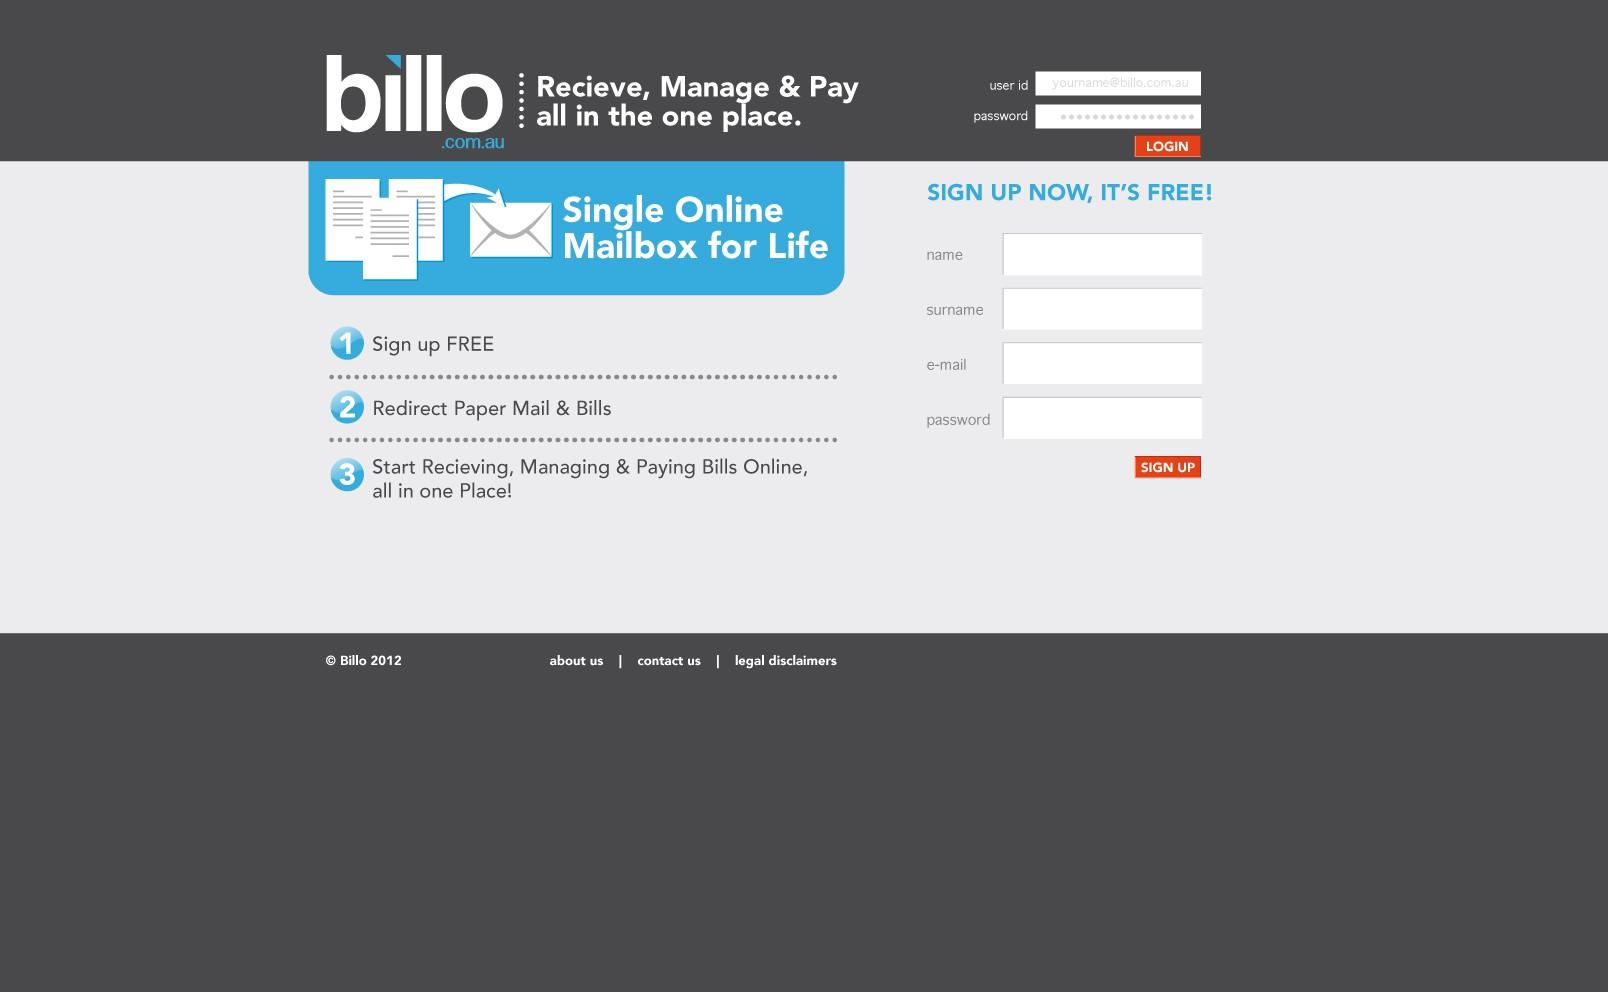 Create the next website design for Billo